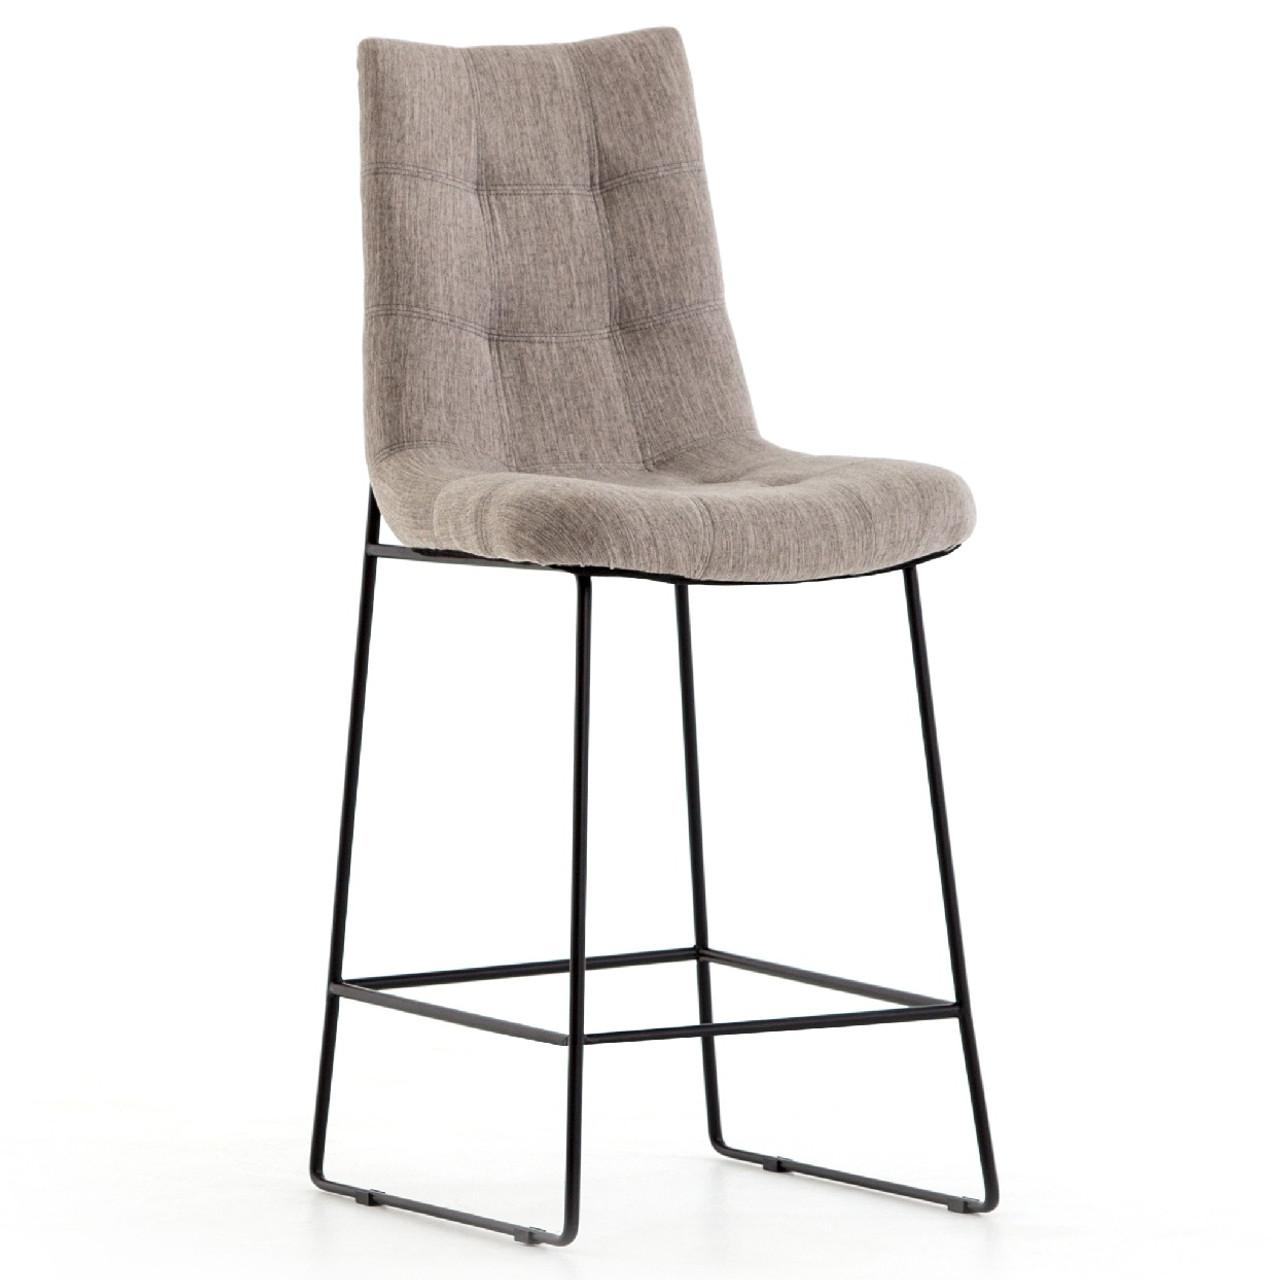 Admirable Camile Black Iron Leg Counter Stool Savile Flannel Lamtechconsult Wood Chair Design Ideas Lamtechconsultcom